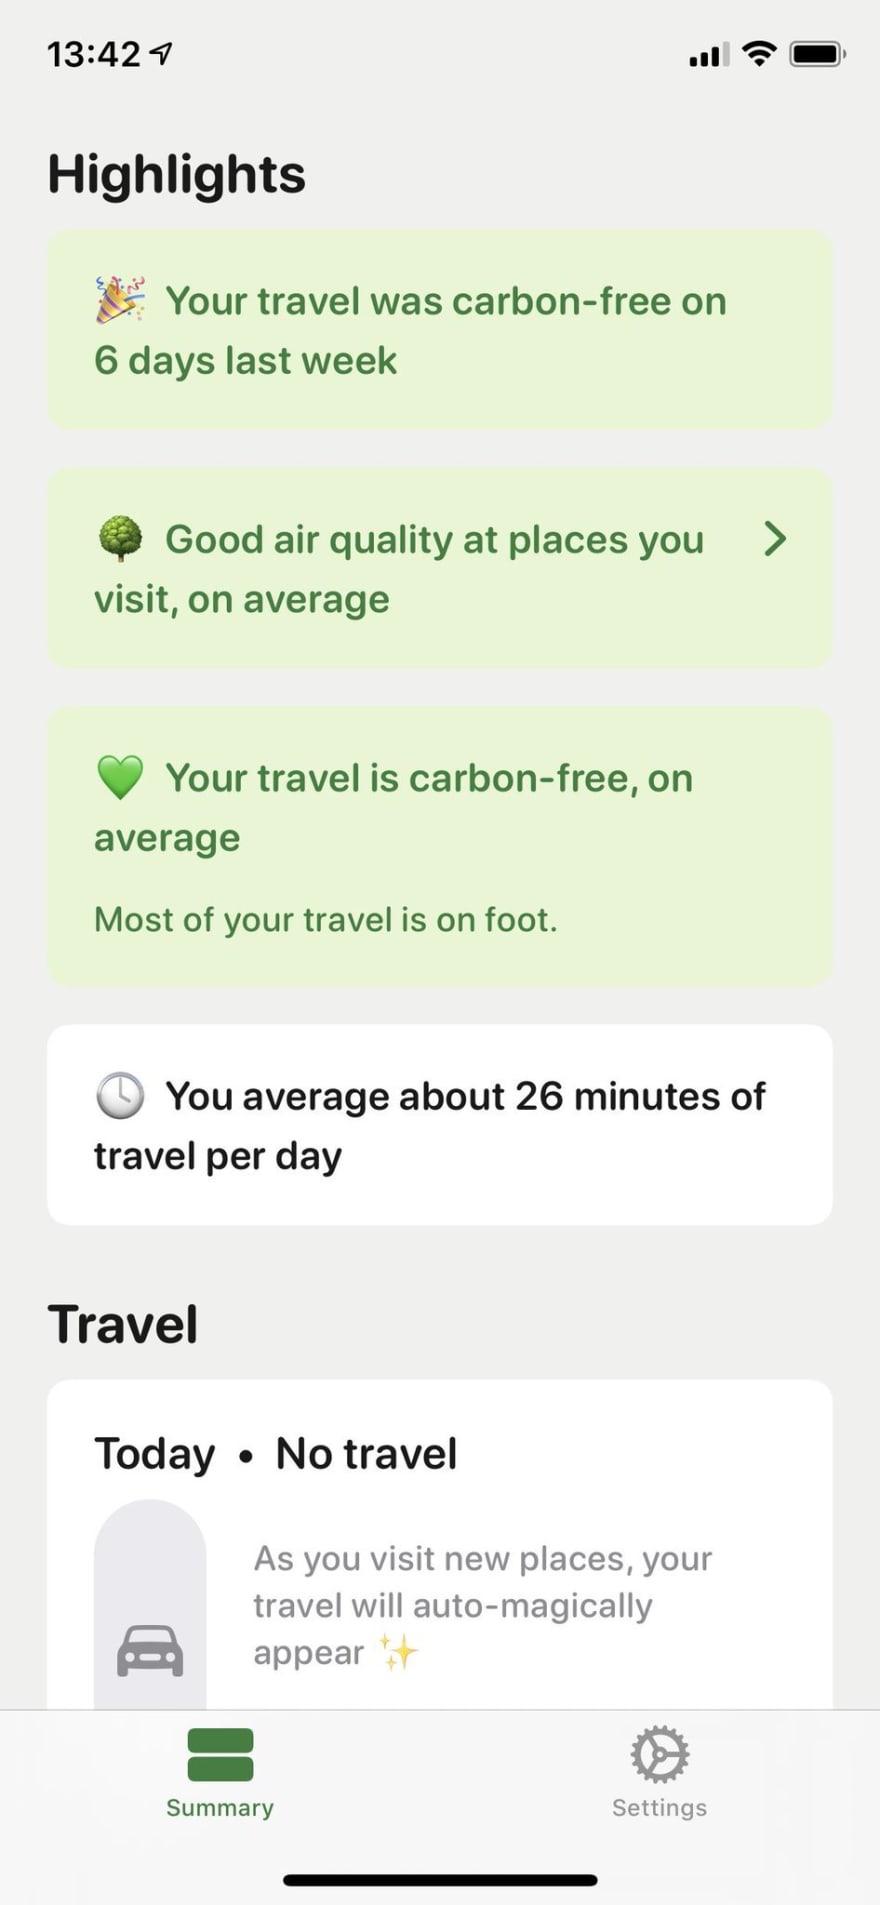 Travel summary screen of the iOS app